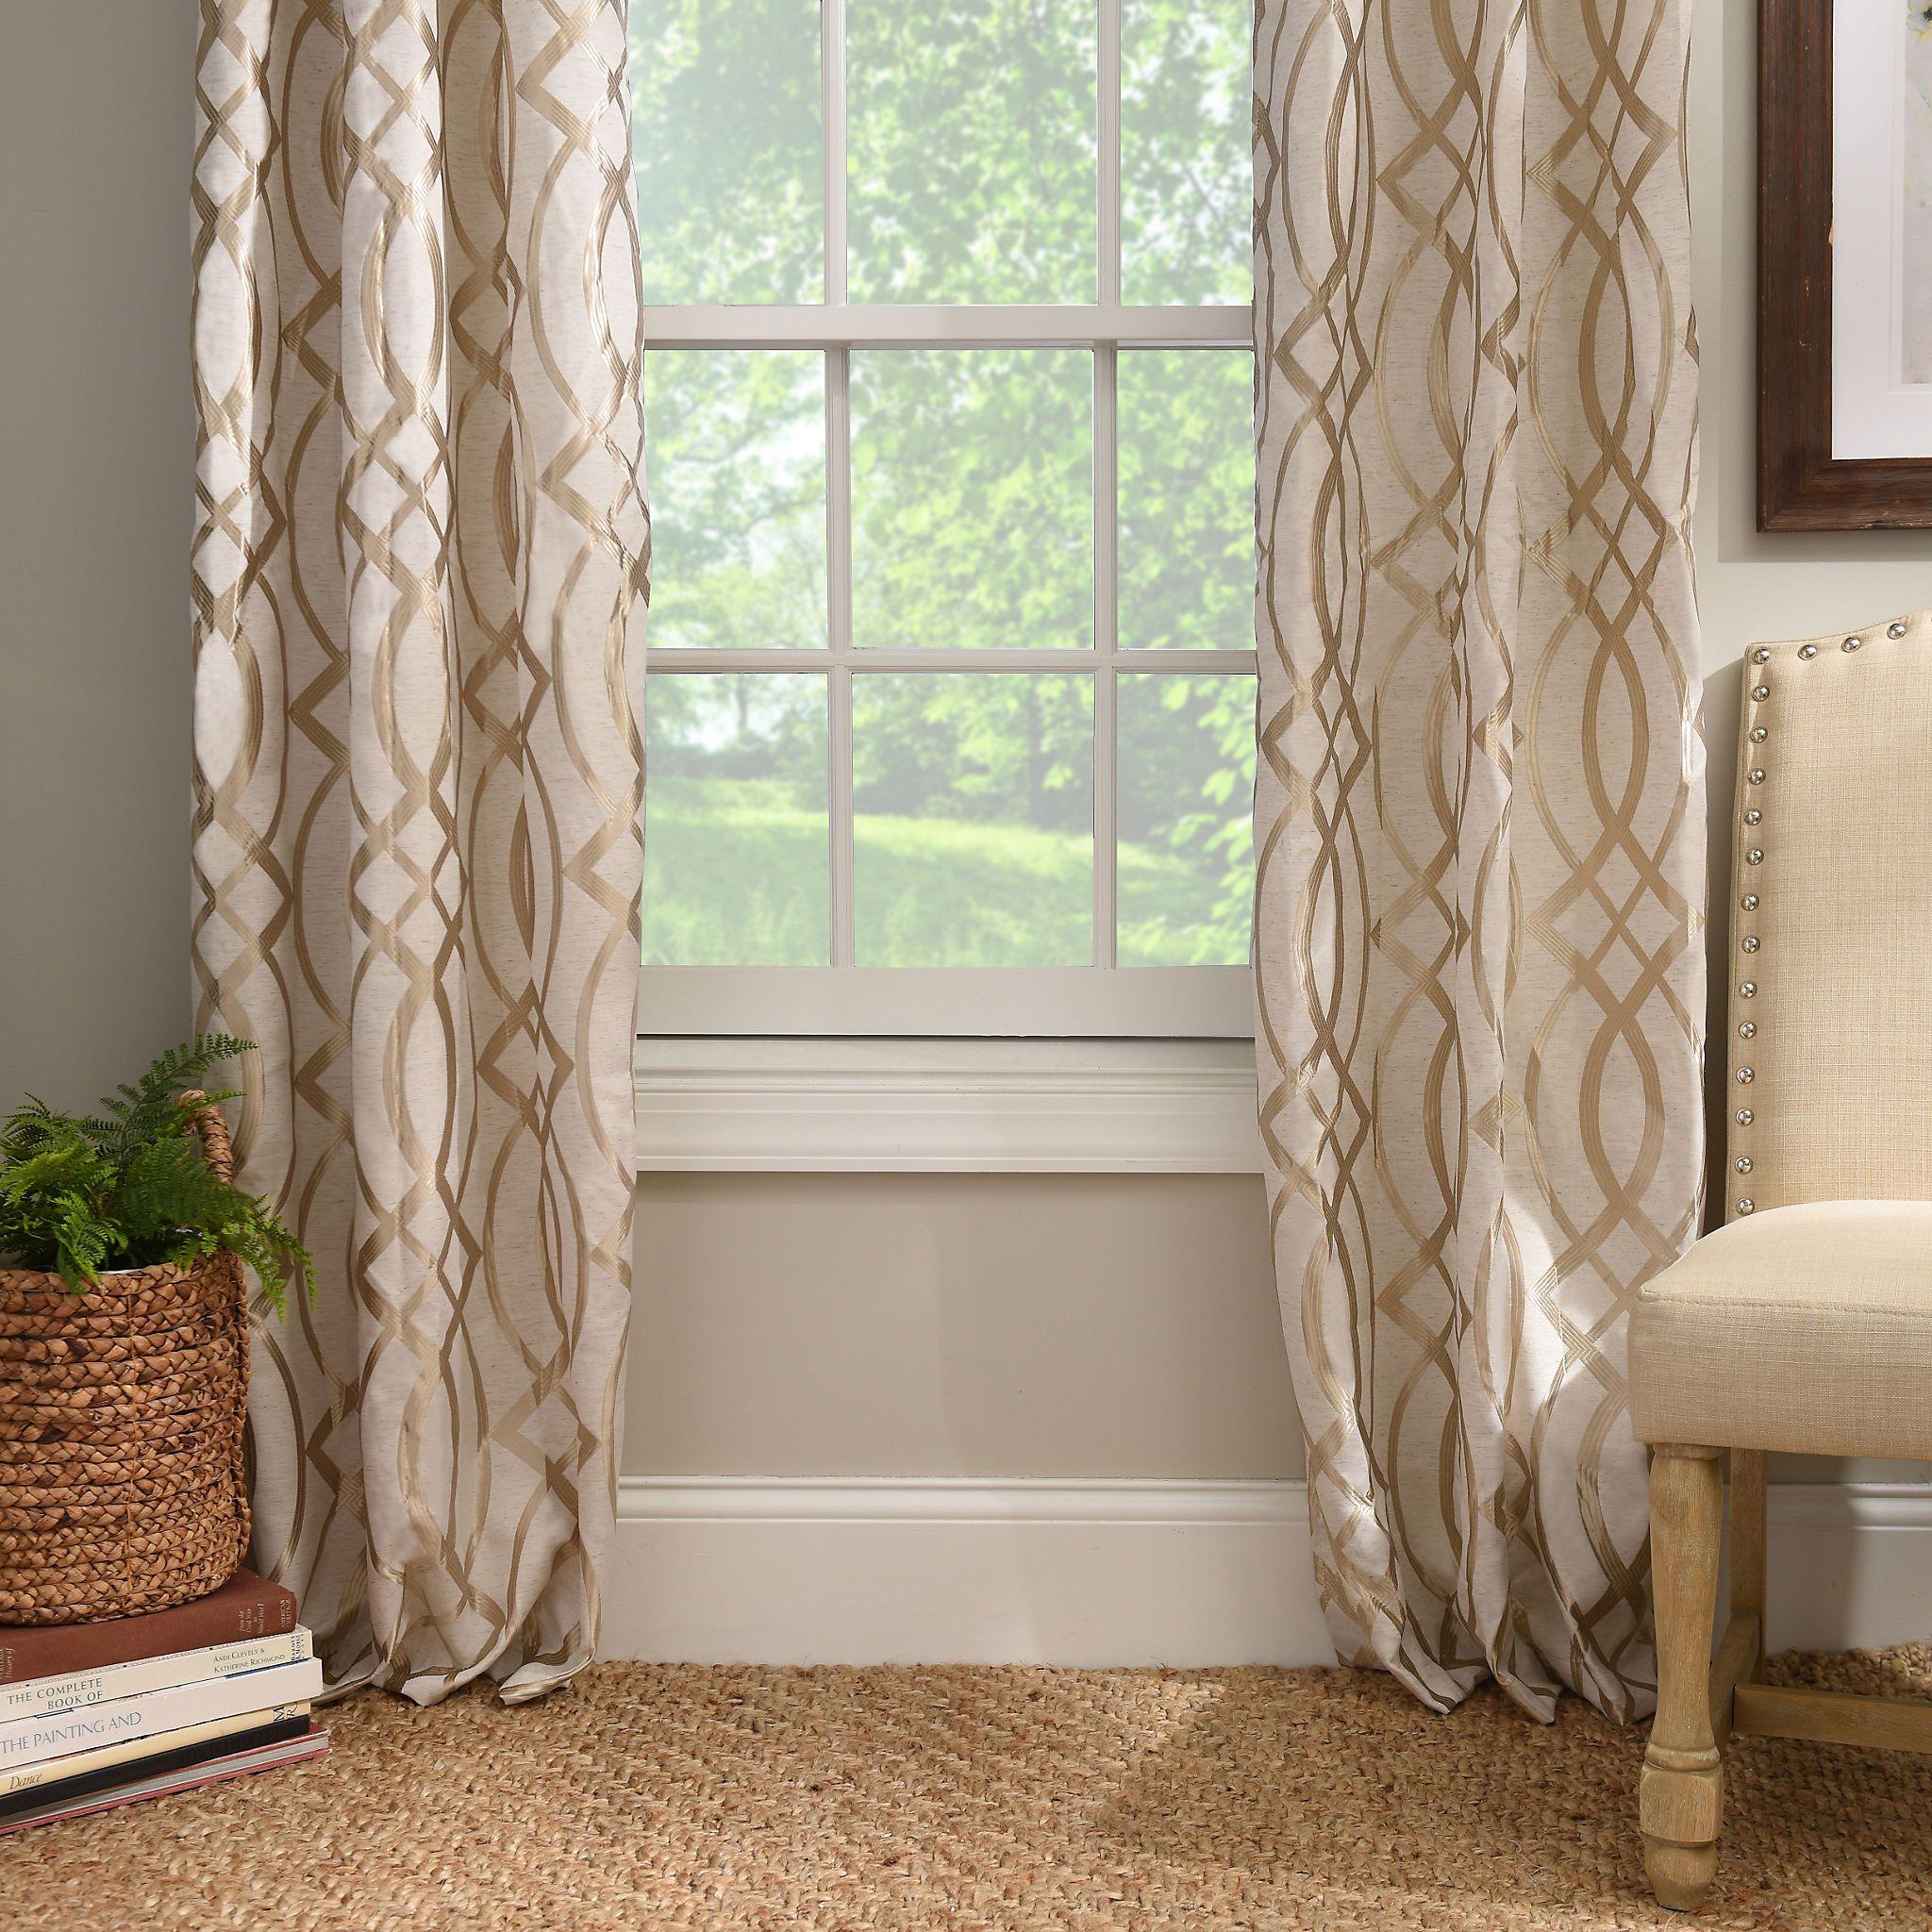 new rugs treatments default curtains section kirklands window uts arrivals drapes